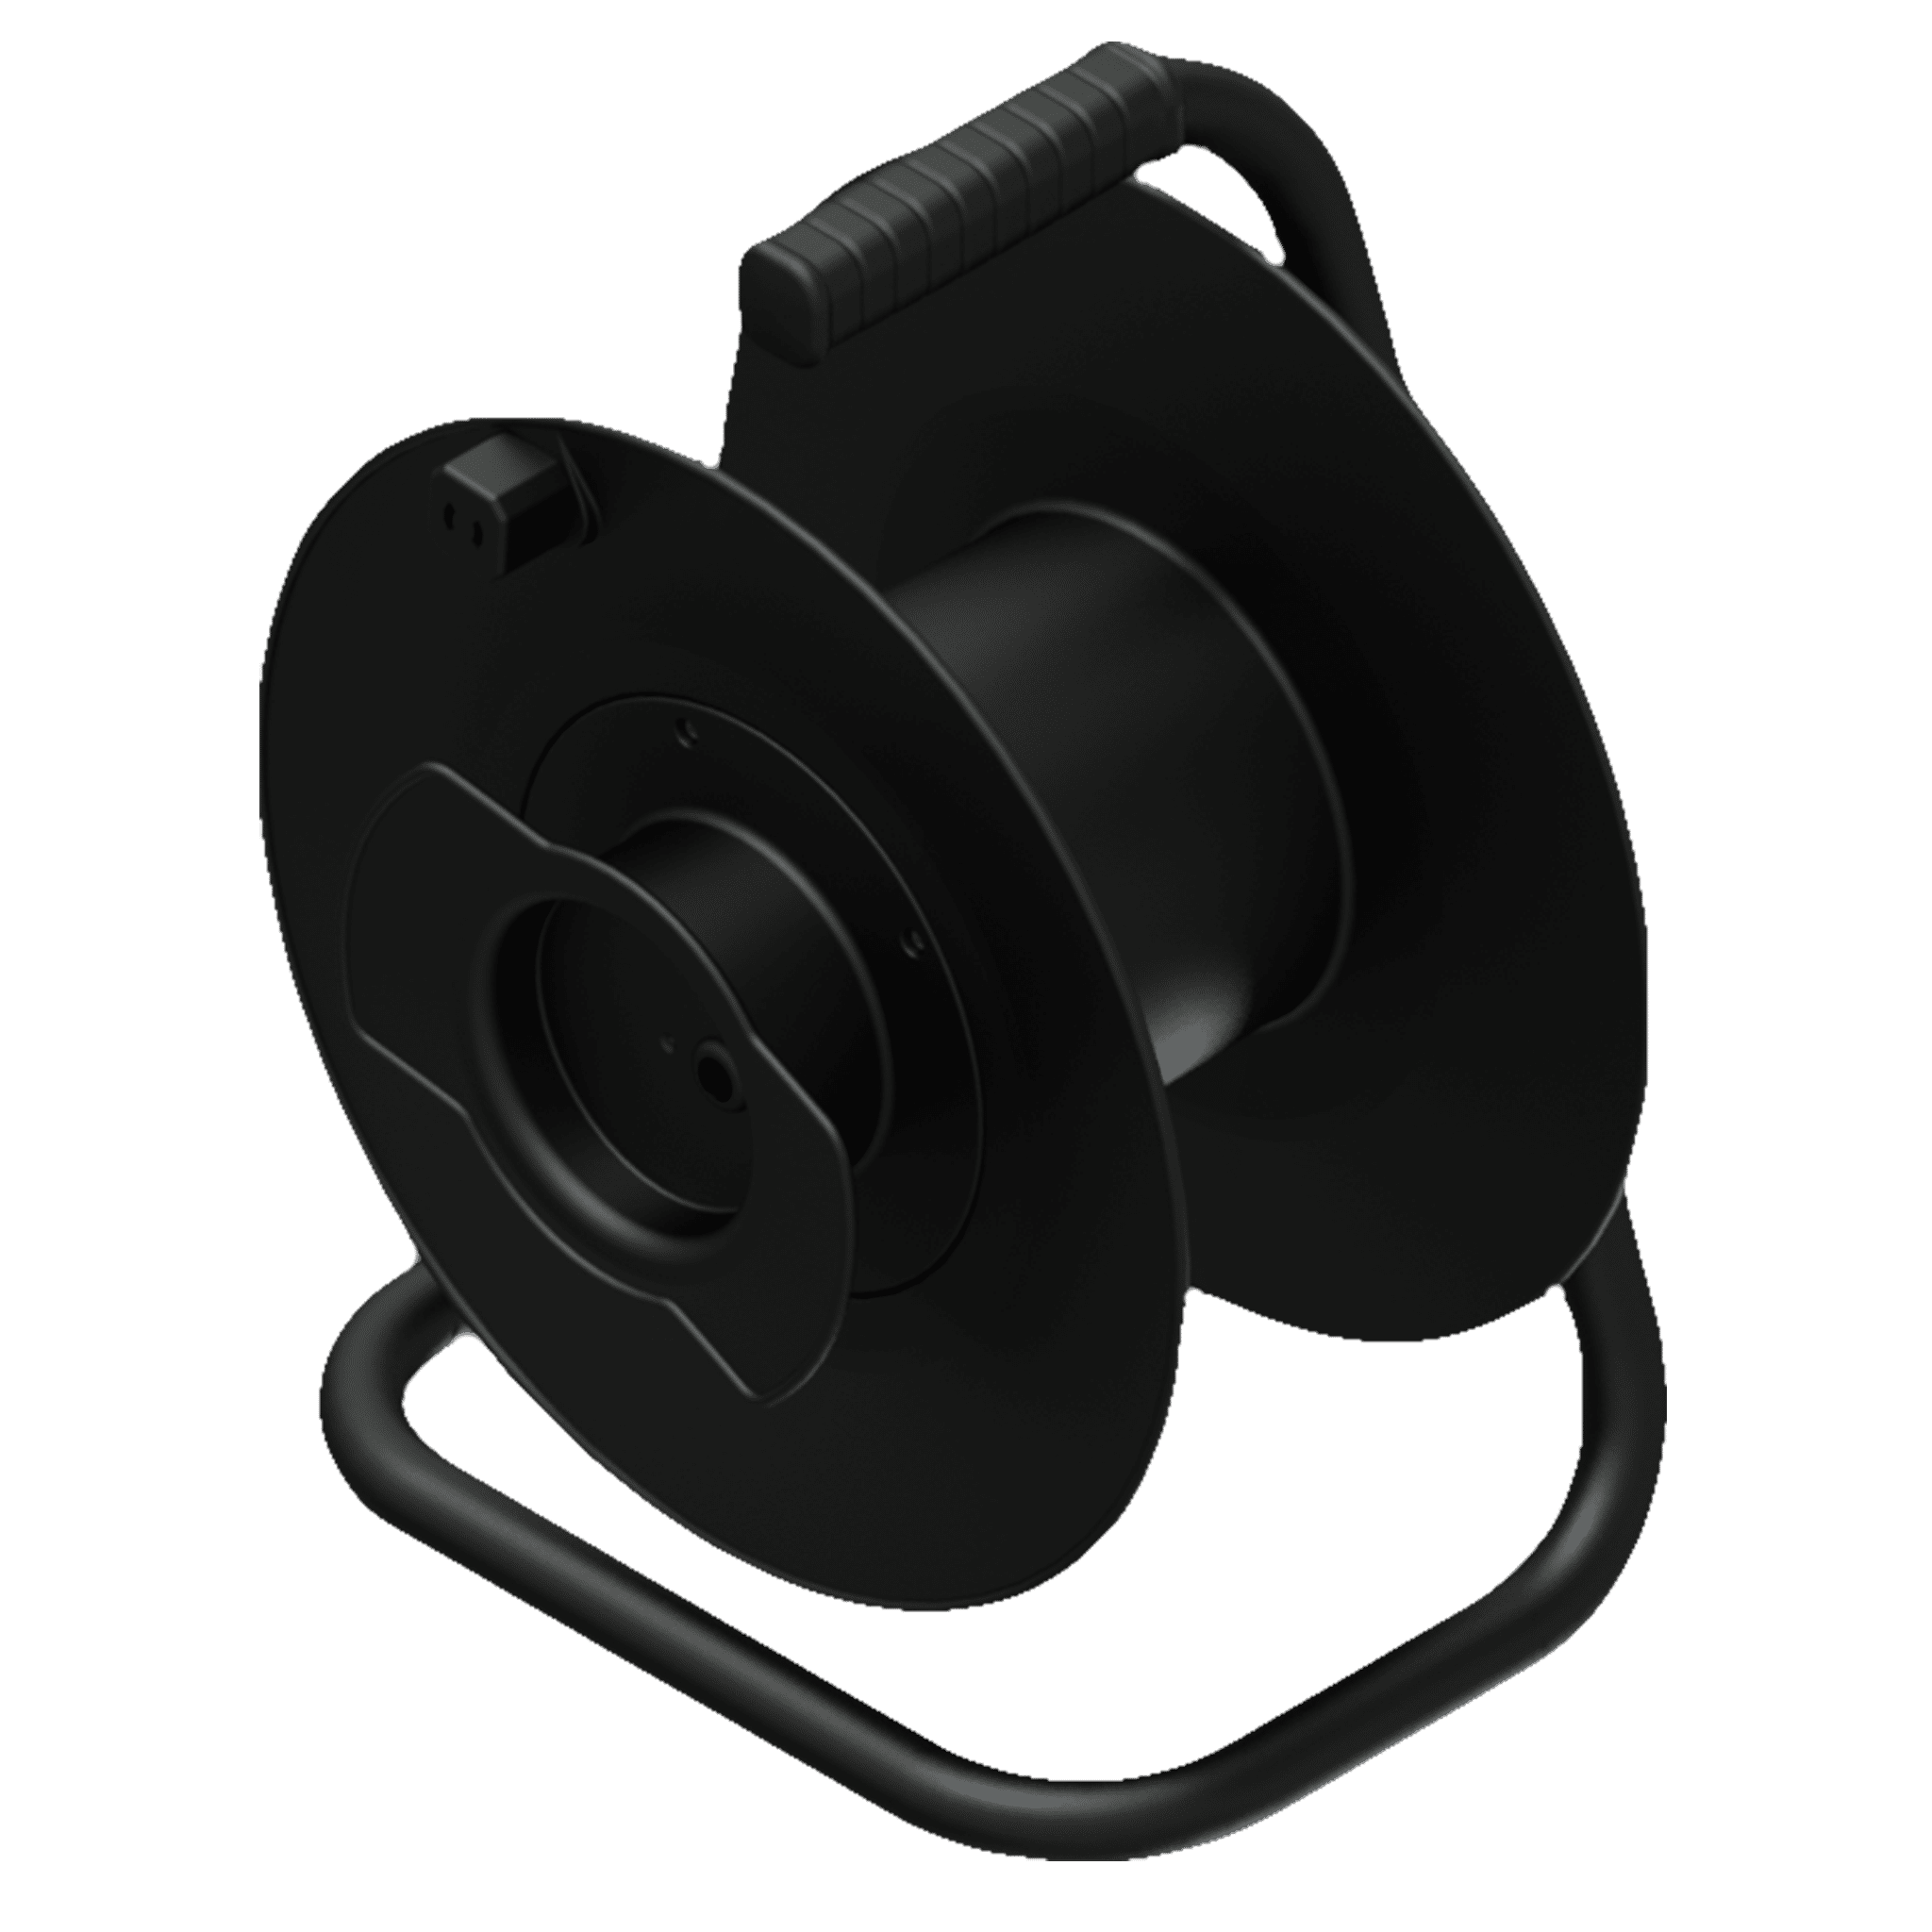 CDM132 - Cable reel plastic - Ø 240 mm